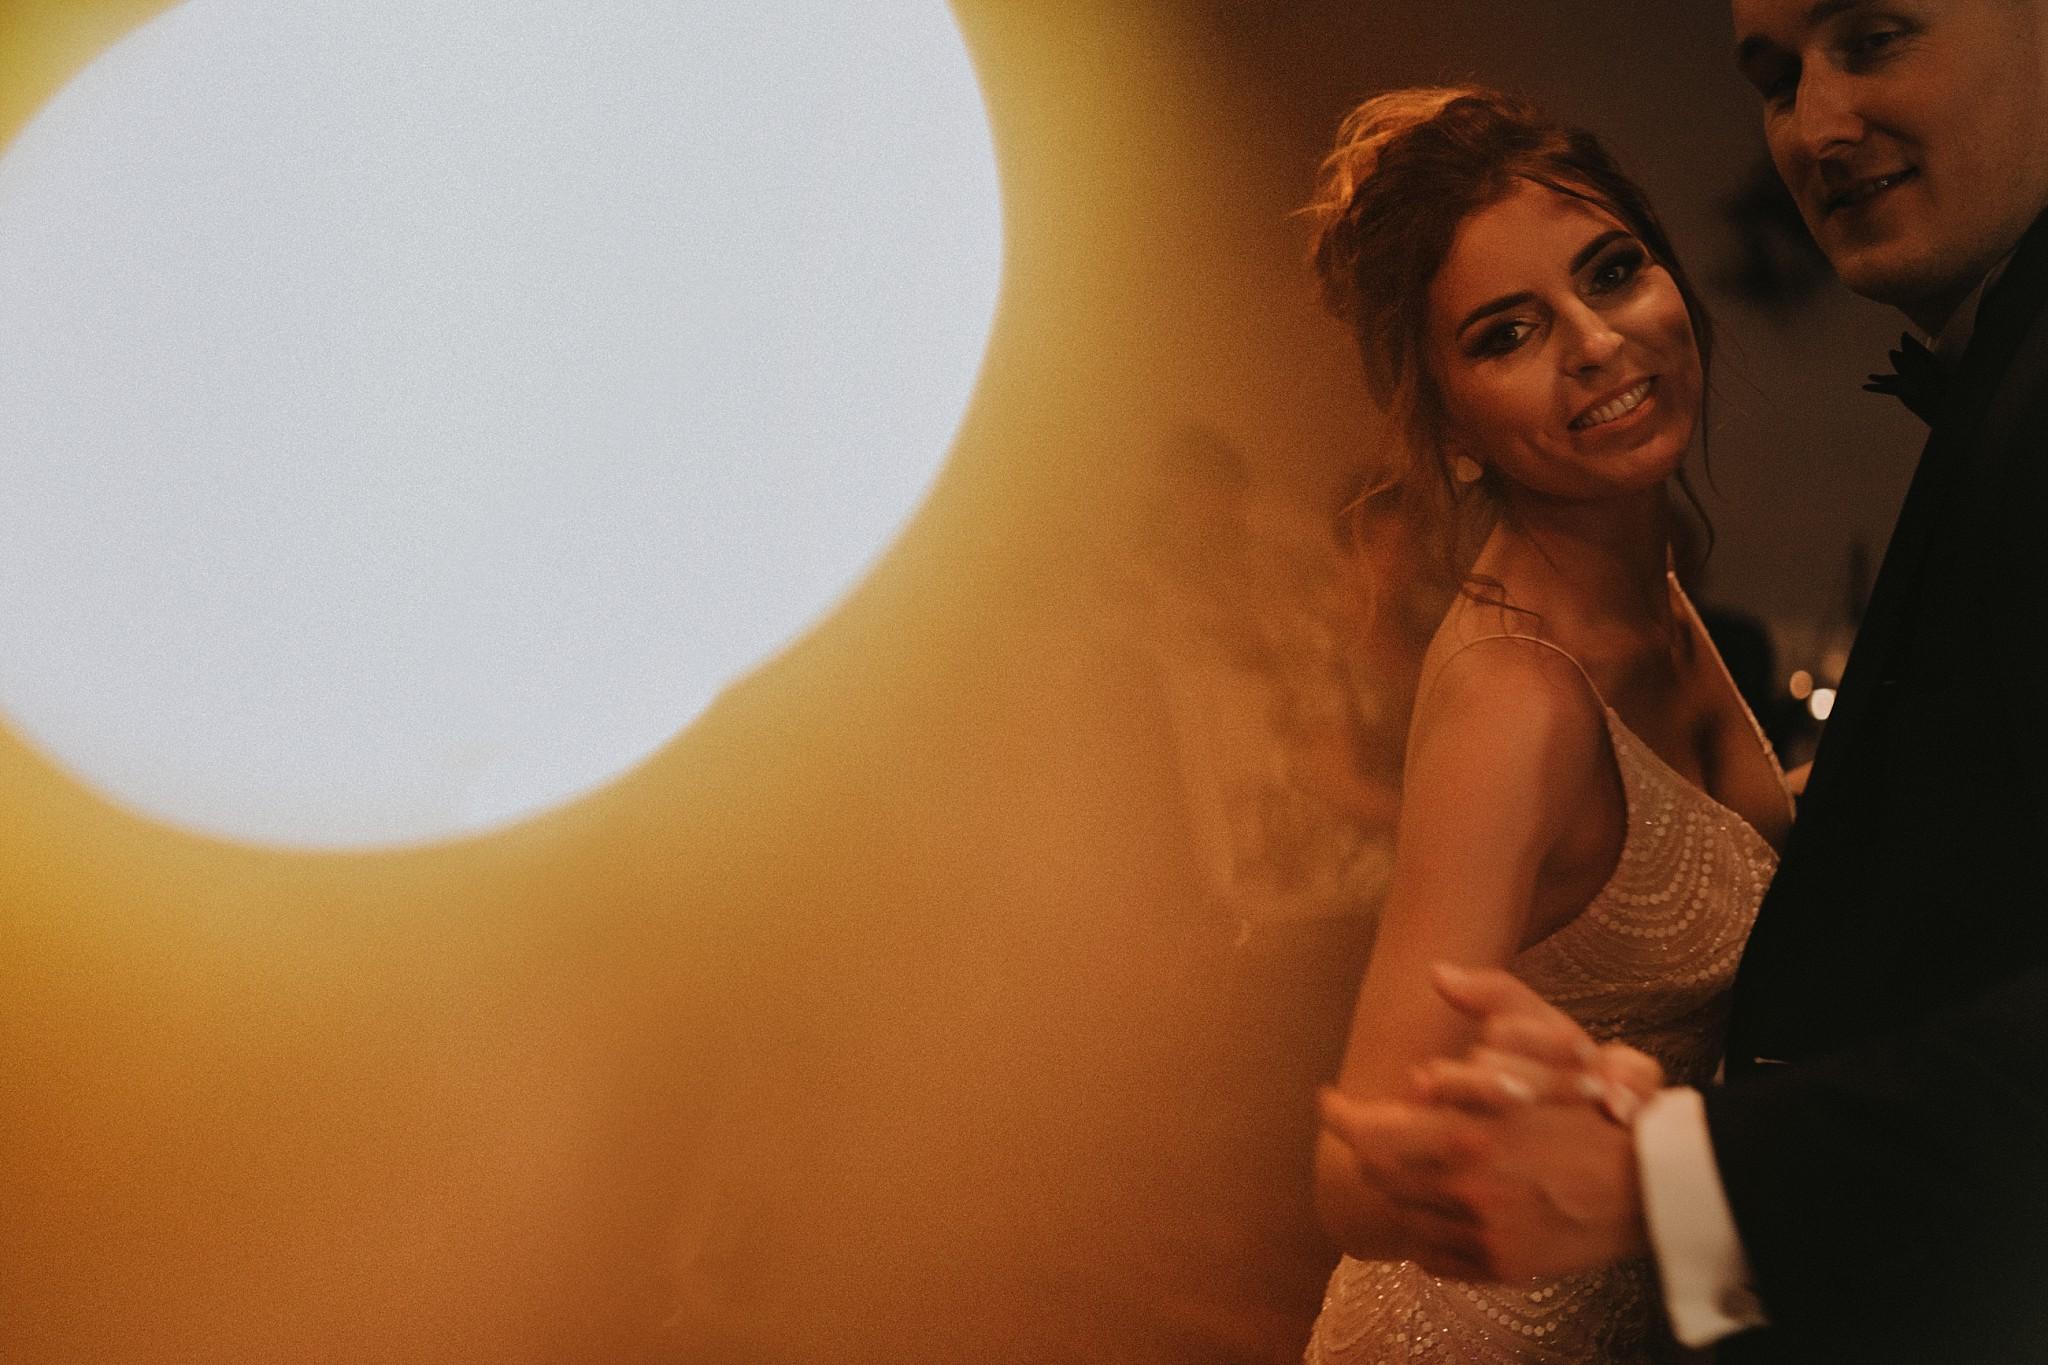 fotograf poznan wesele dobra truskawka piekne wesele pod poznaniem wesele w dobrej truskawce piekna para mloda slub marzen slub koronawirus slub listopad wesele koronawirus 489